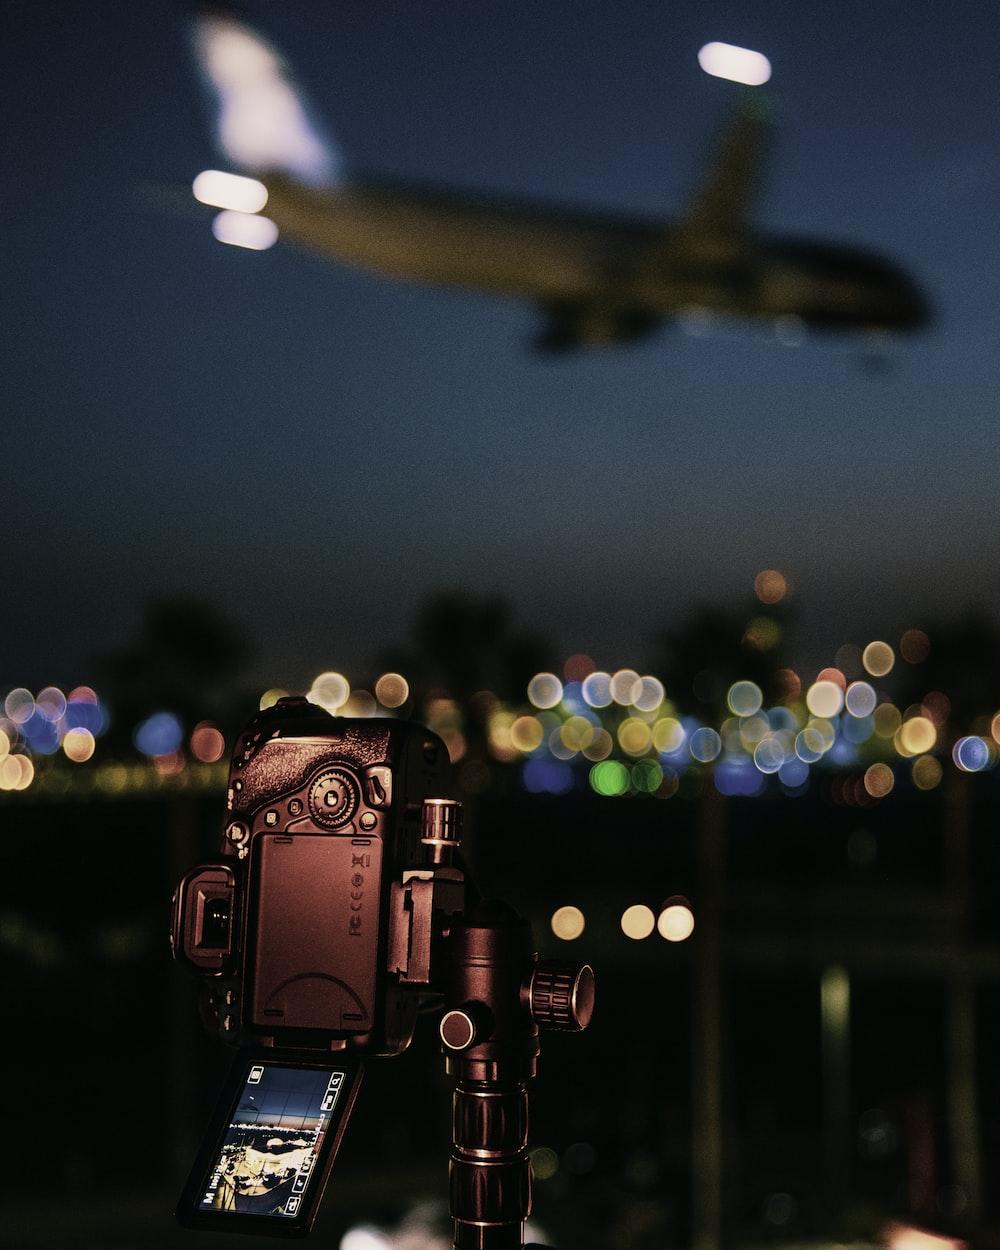 black video camera capturing an airplane in flight